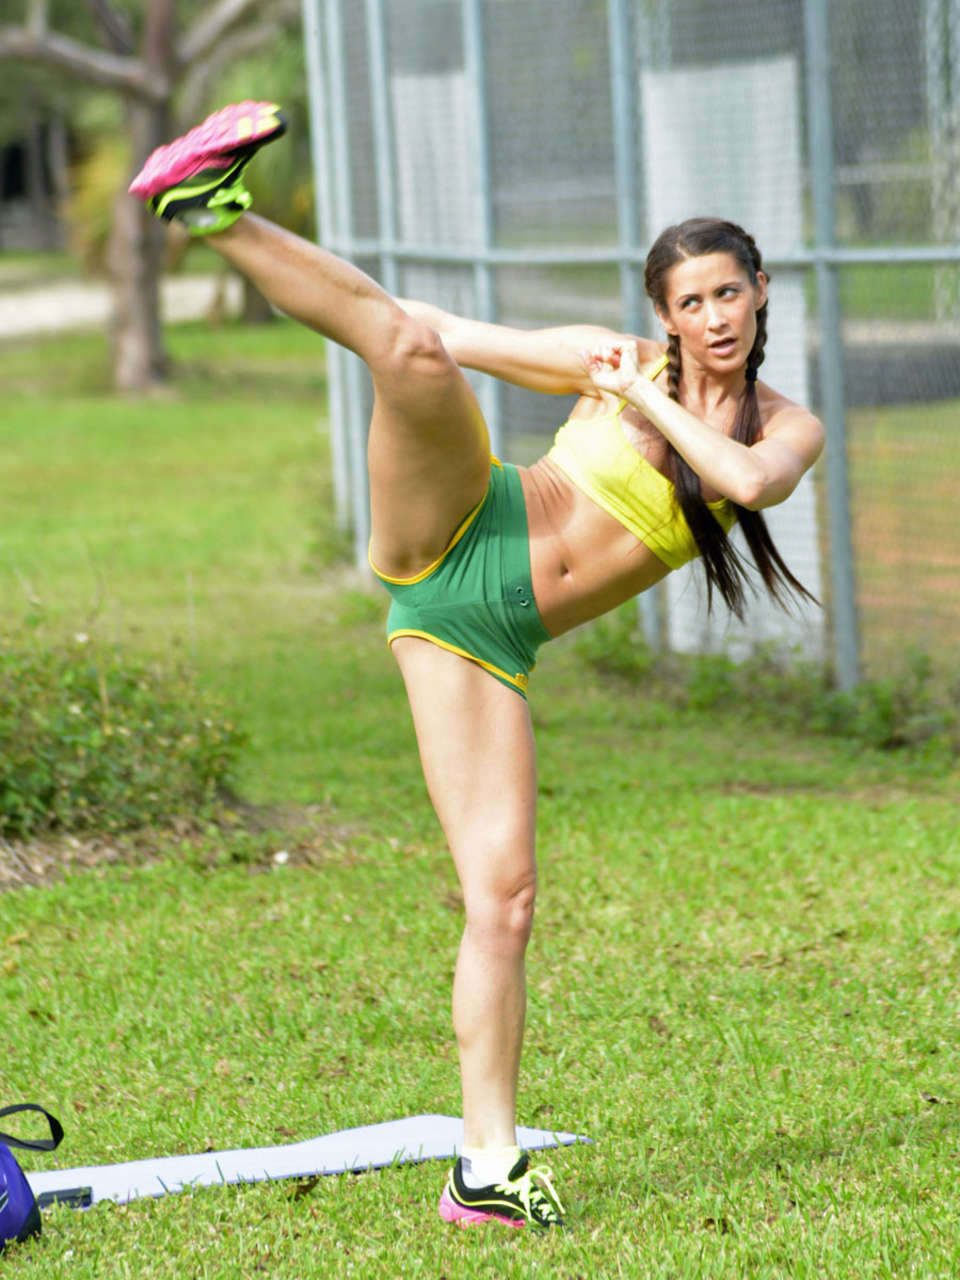 Danica Patrick 2018 >> Anais Zanotti Workout Photos: 2014 in park -06 - GotCeleb